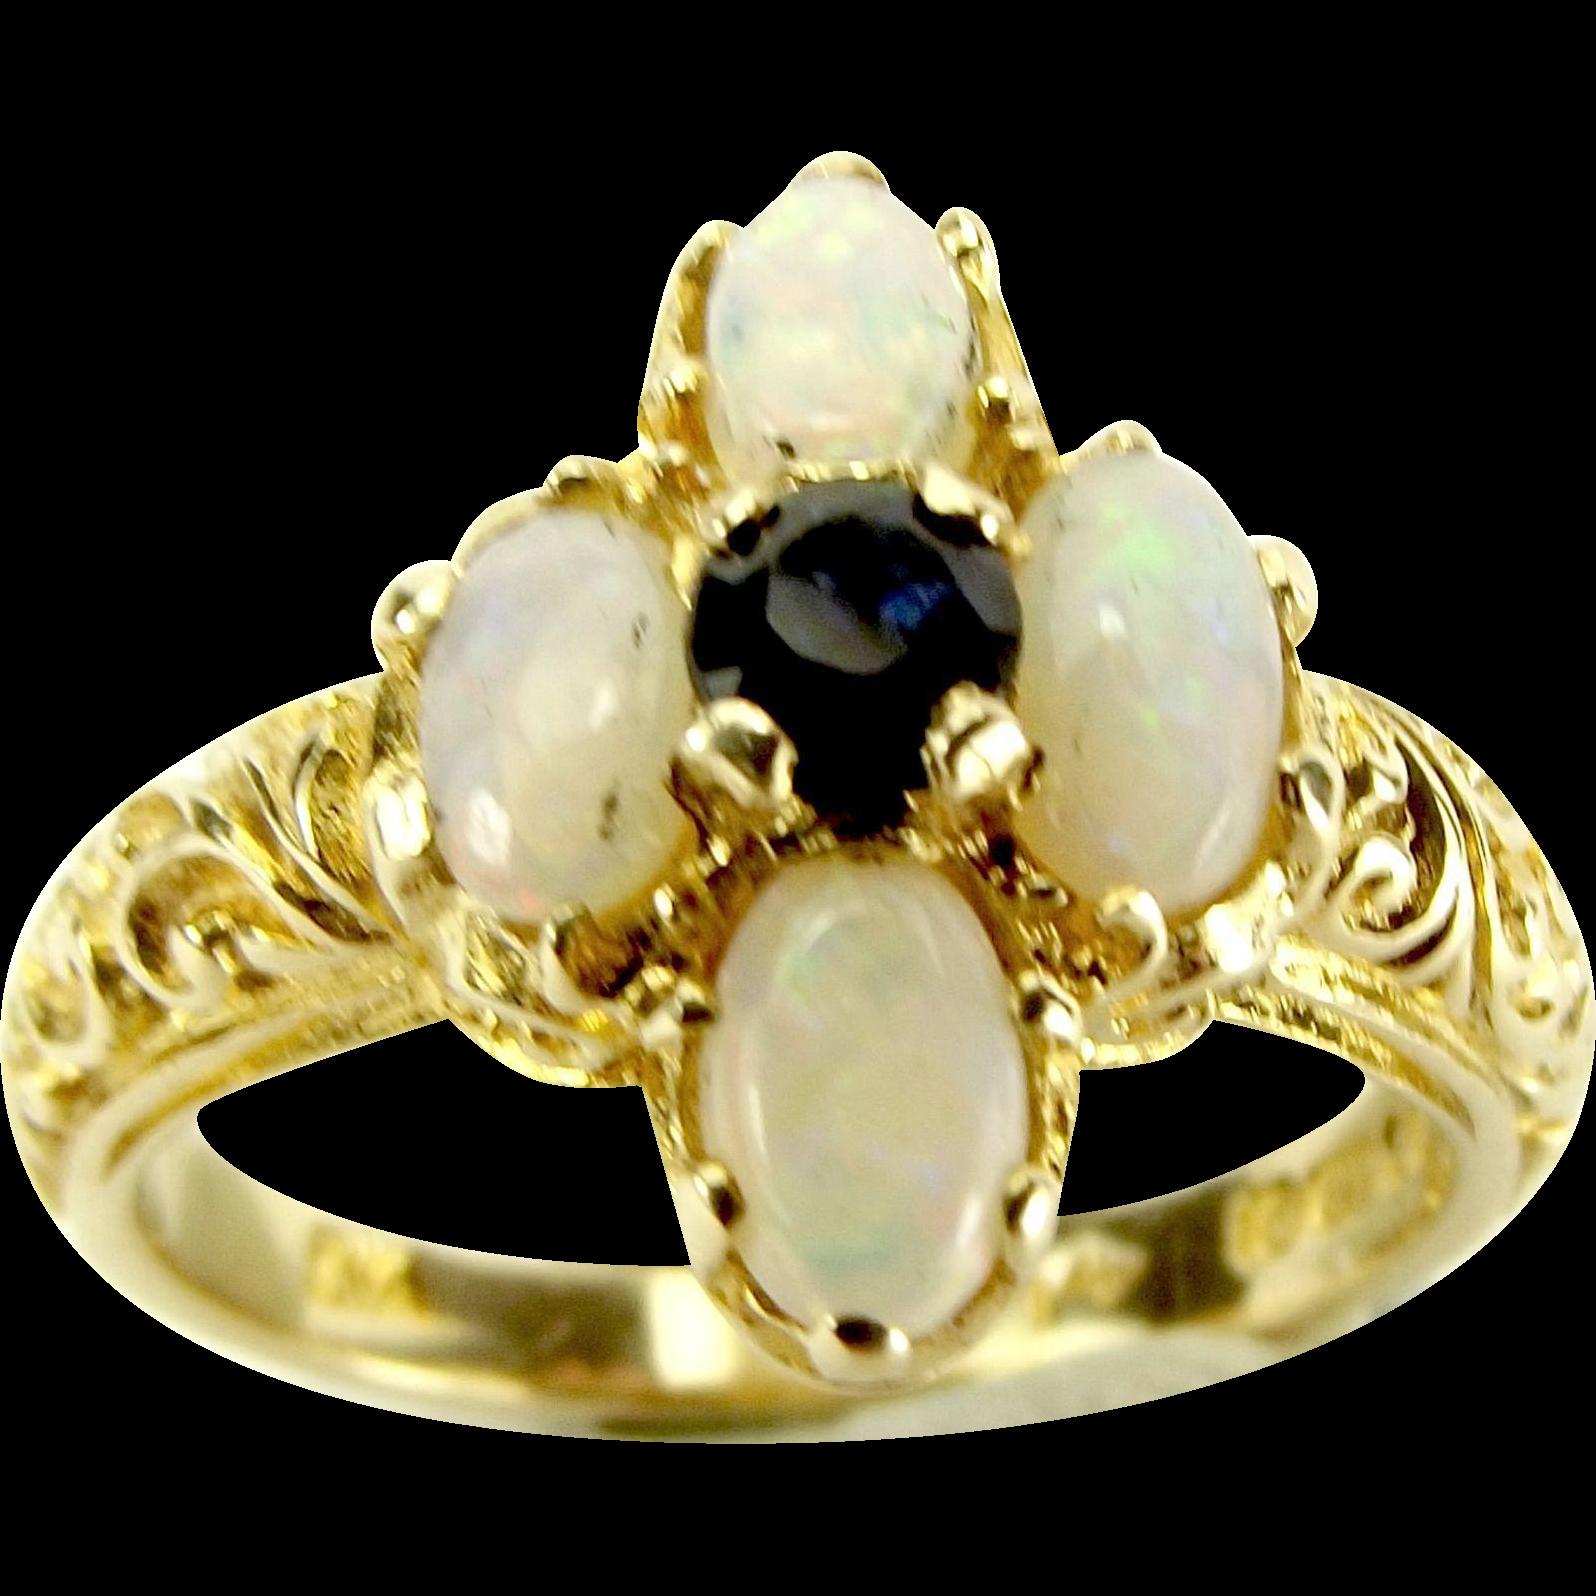 Vintage 9ct gold opal sapphire ring birmingham 1976 for Sell jewelry birmingham al